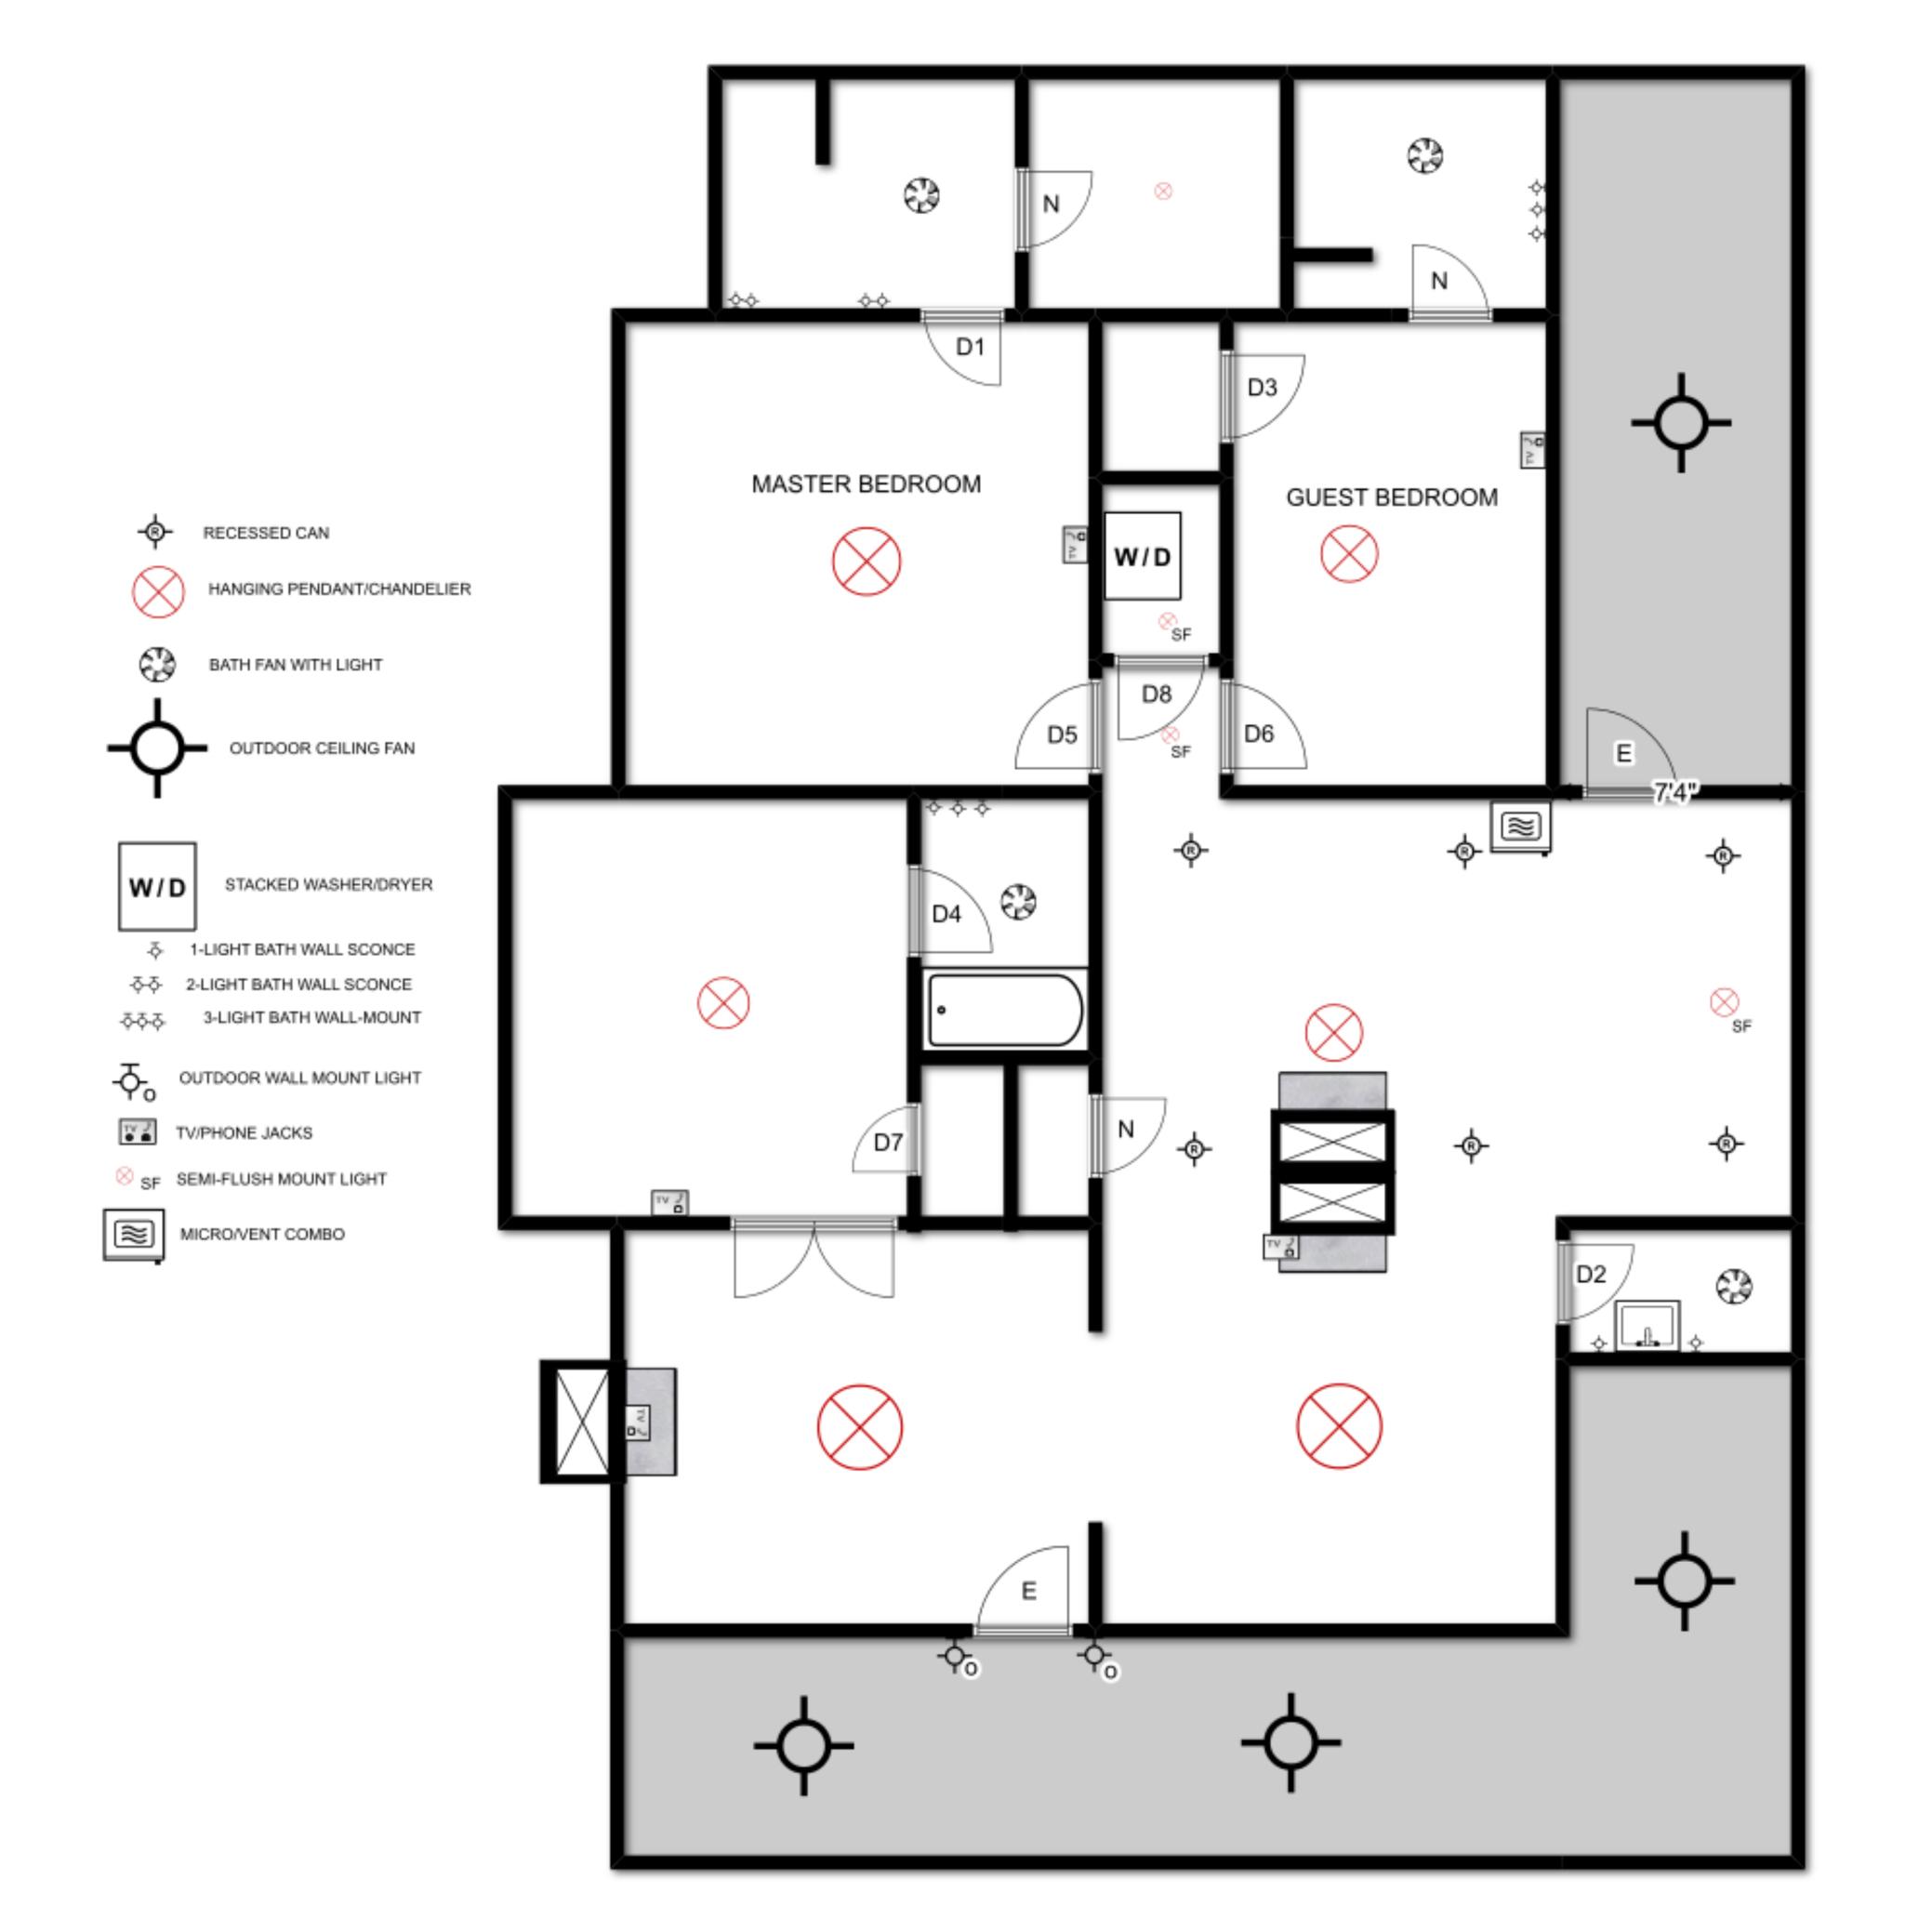 medium resolution of elizabeth burns design electrical plan format 1500w